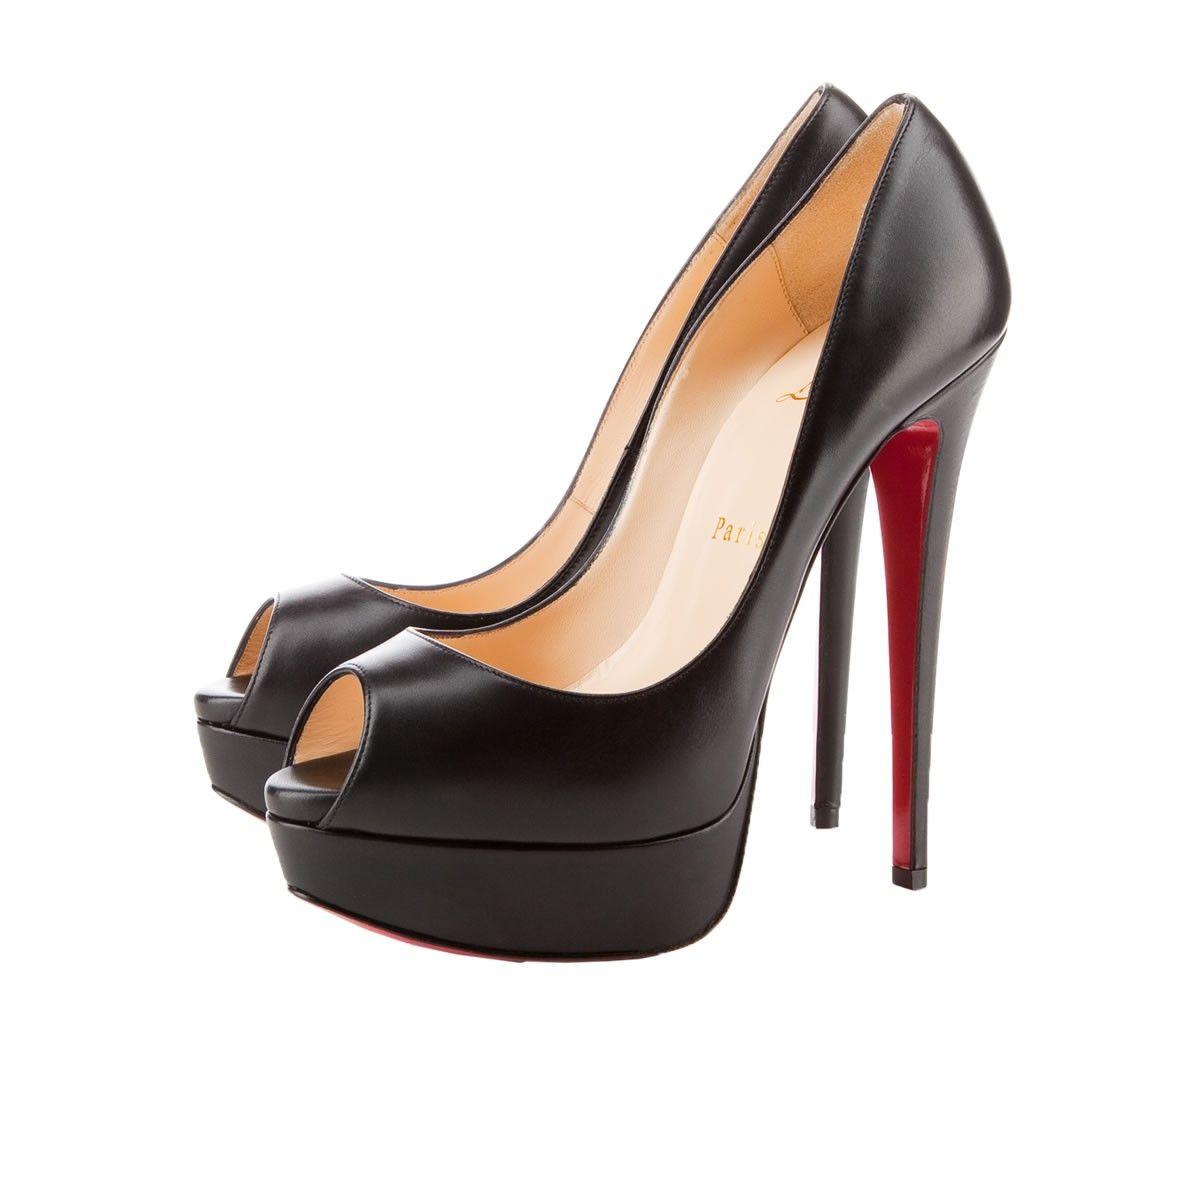 Black peep toe pumps, Heels